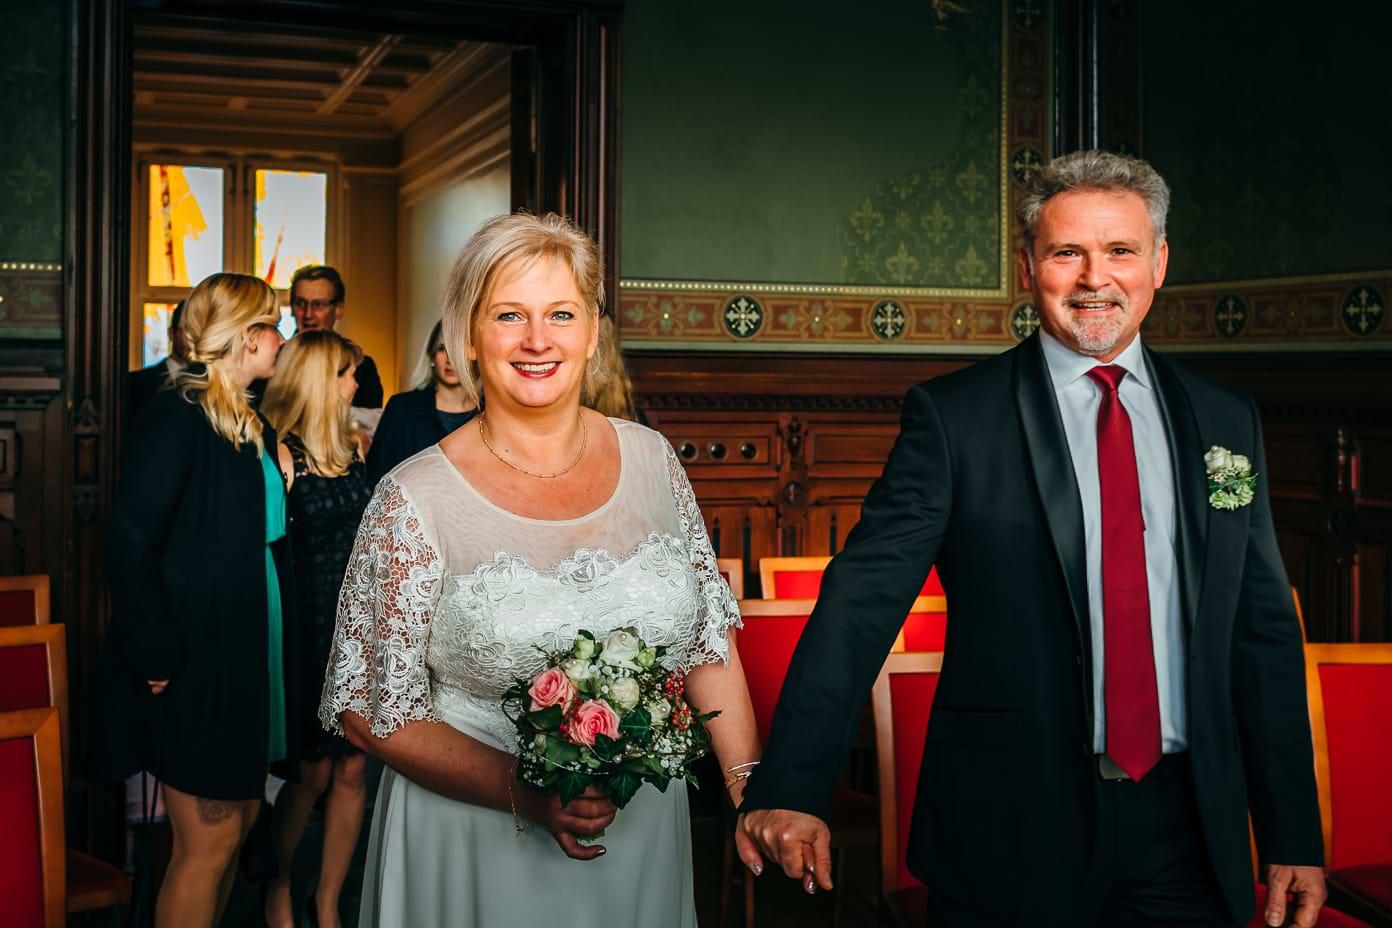 Das Brautpaar betritt das Trauzimmer